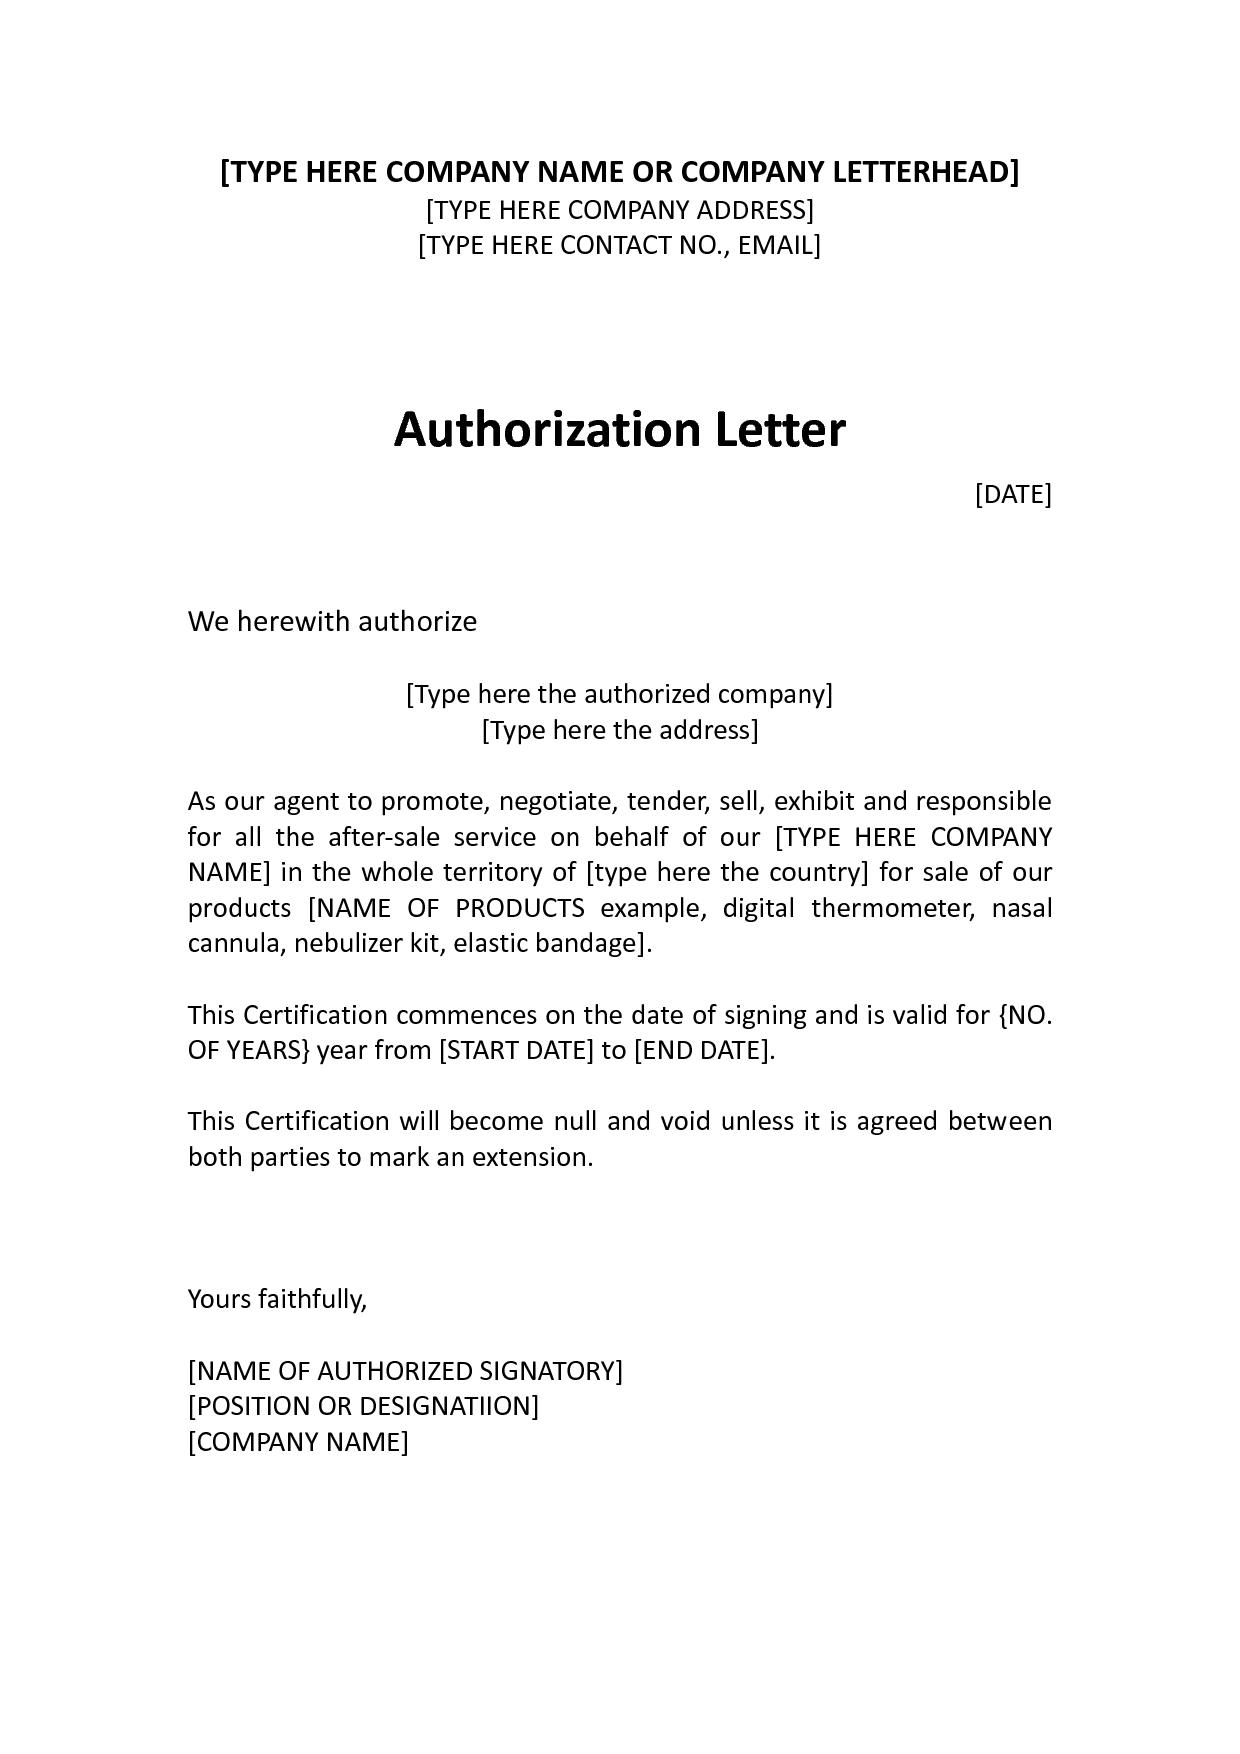 Parent Permission Letter Template - Authorization Distributor Letter Sample Distributor Dealer